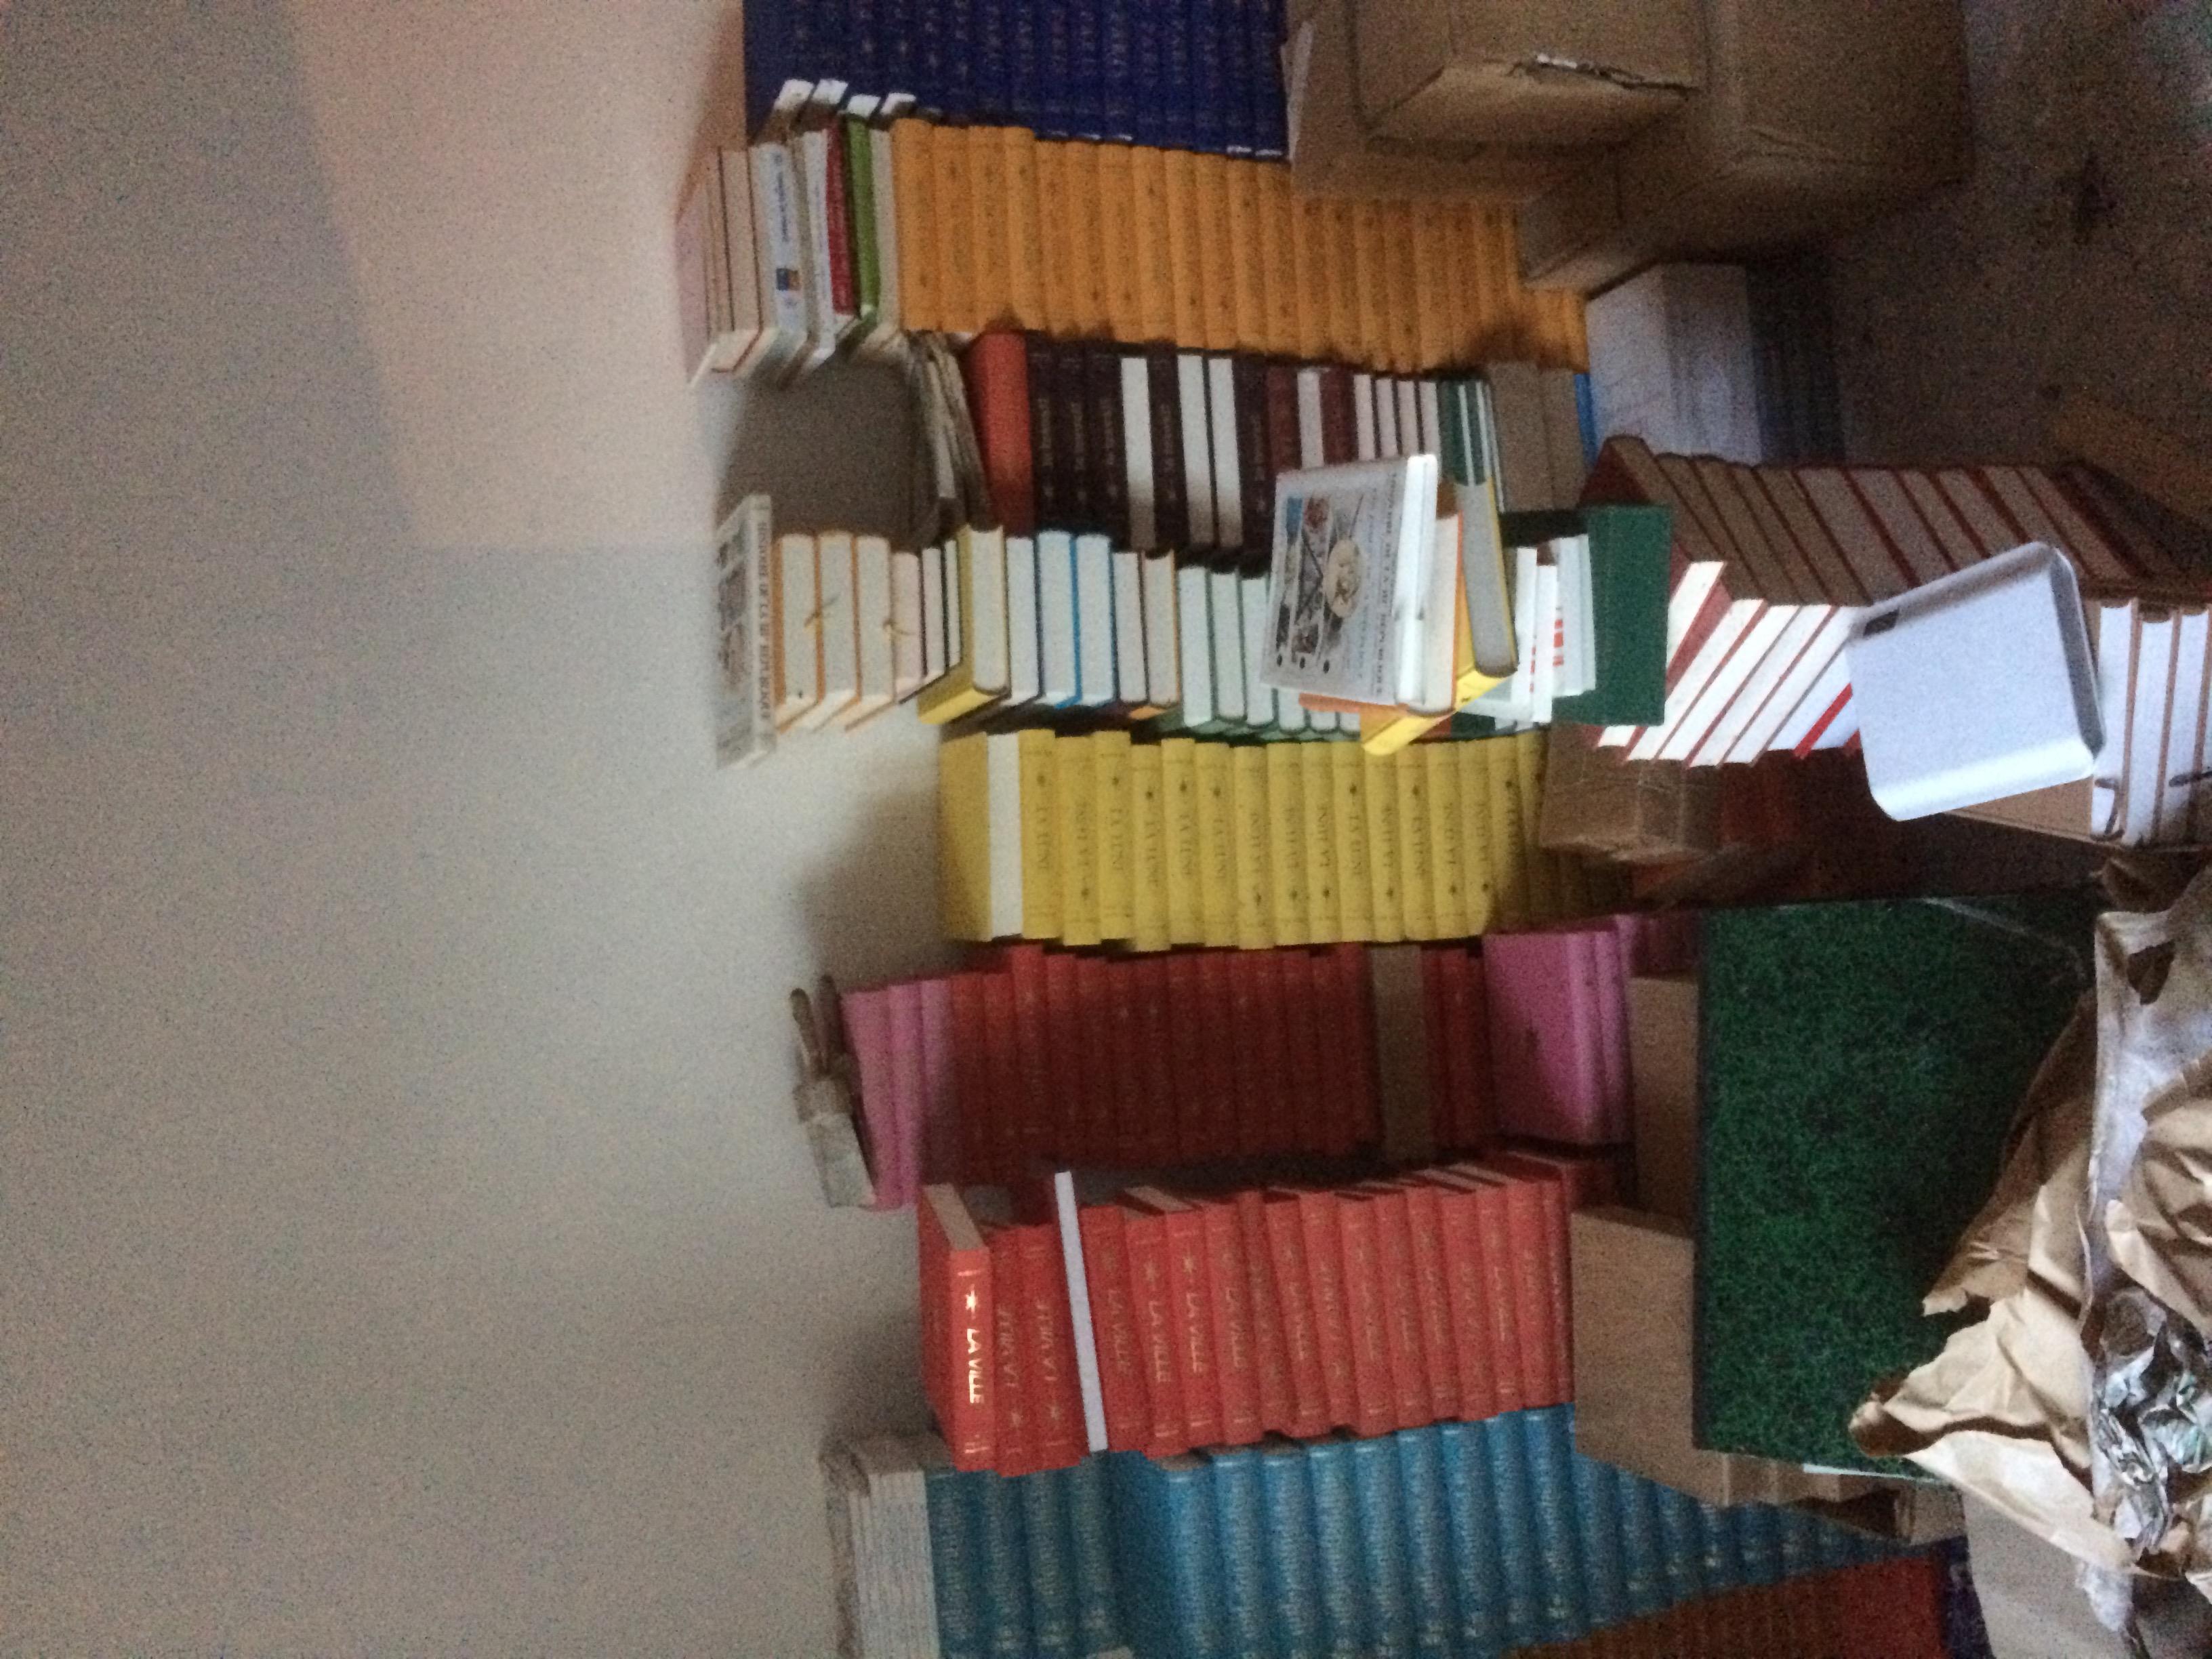 http://image.poubelles.be/uouU75a3-4O8O-4OyO-OBoy-uuF4auo5uaa5.jpeg